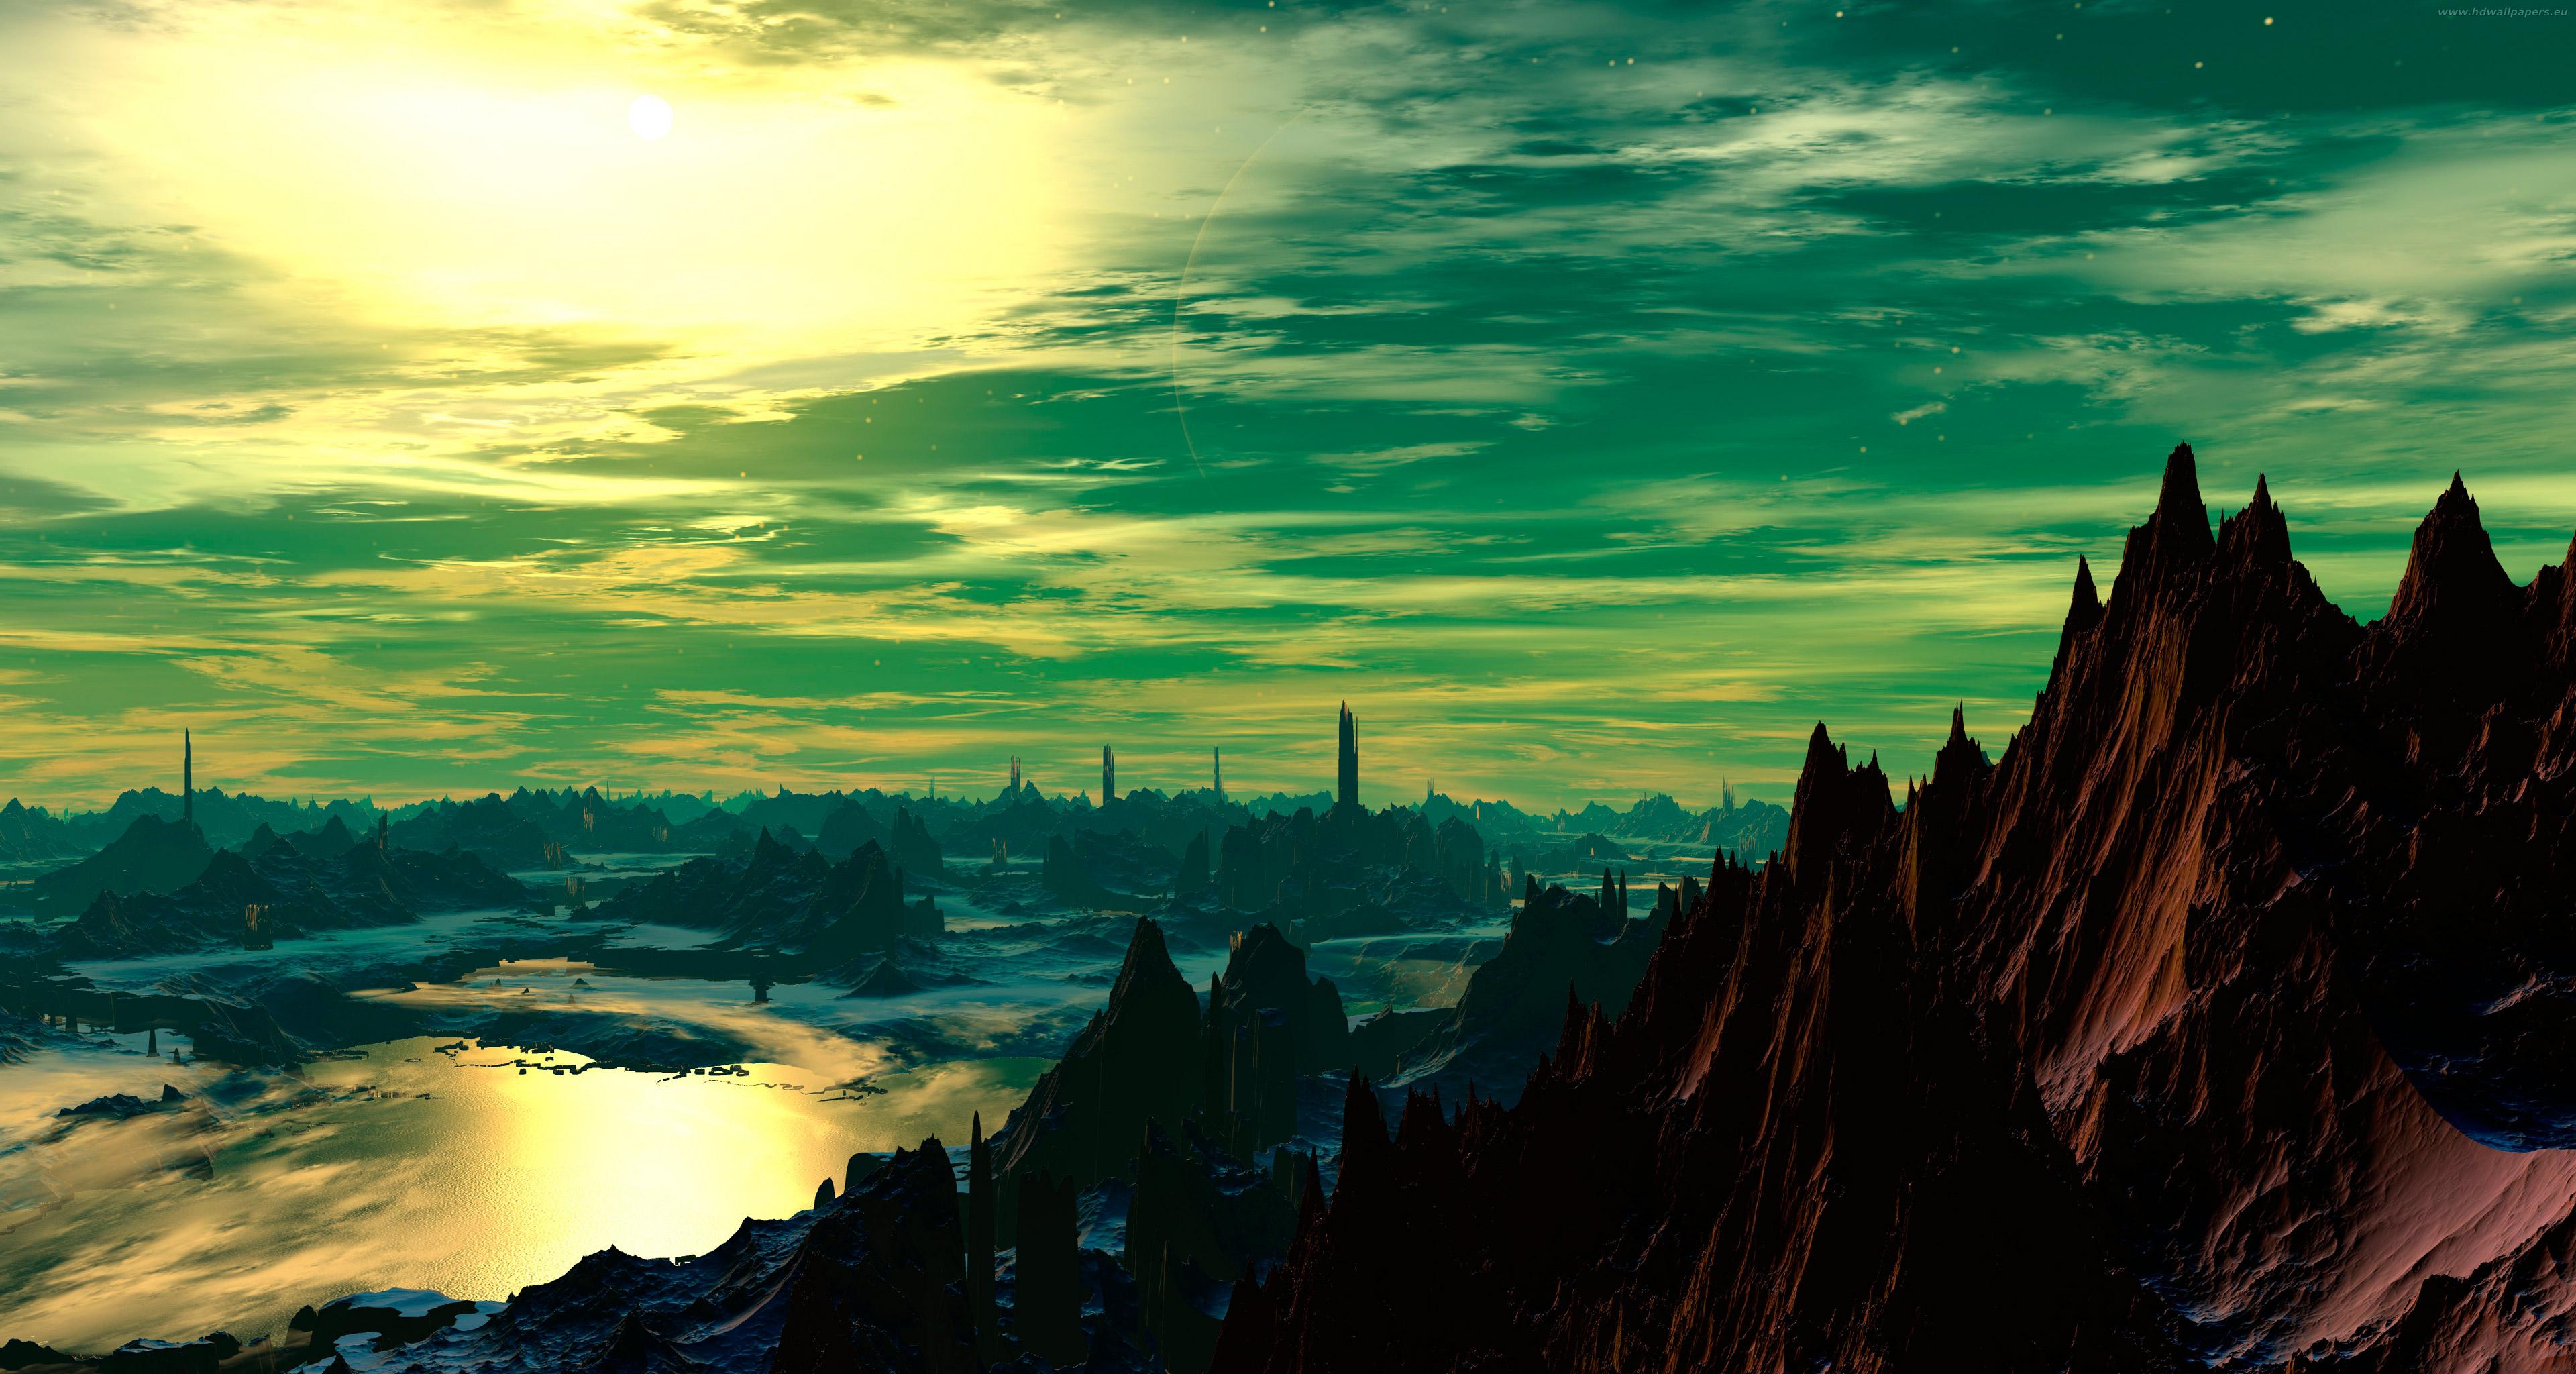 Hd wallpaper ultra - Landscape Ultrahd 3840x2048